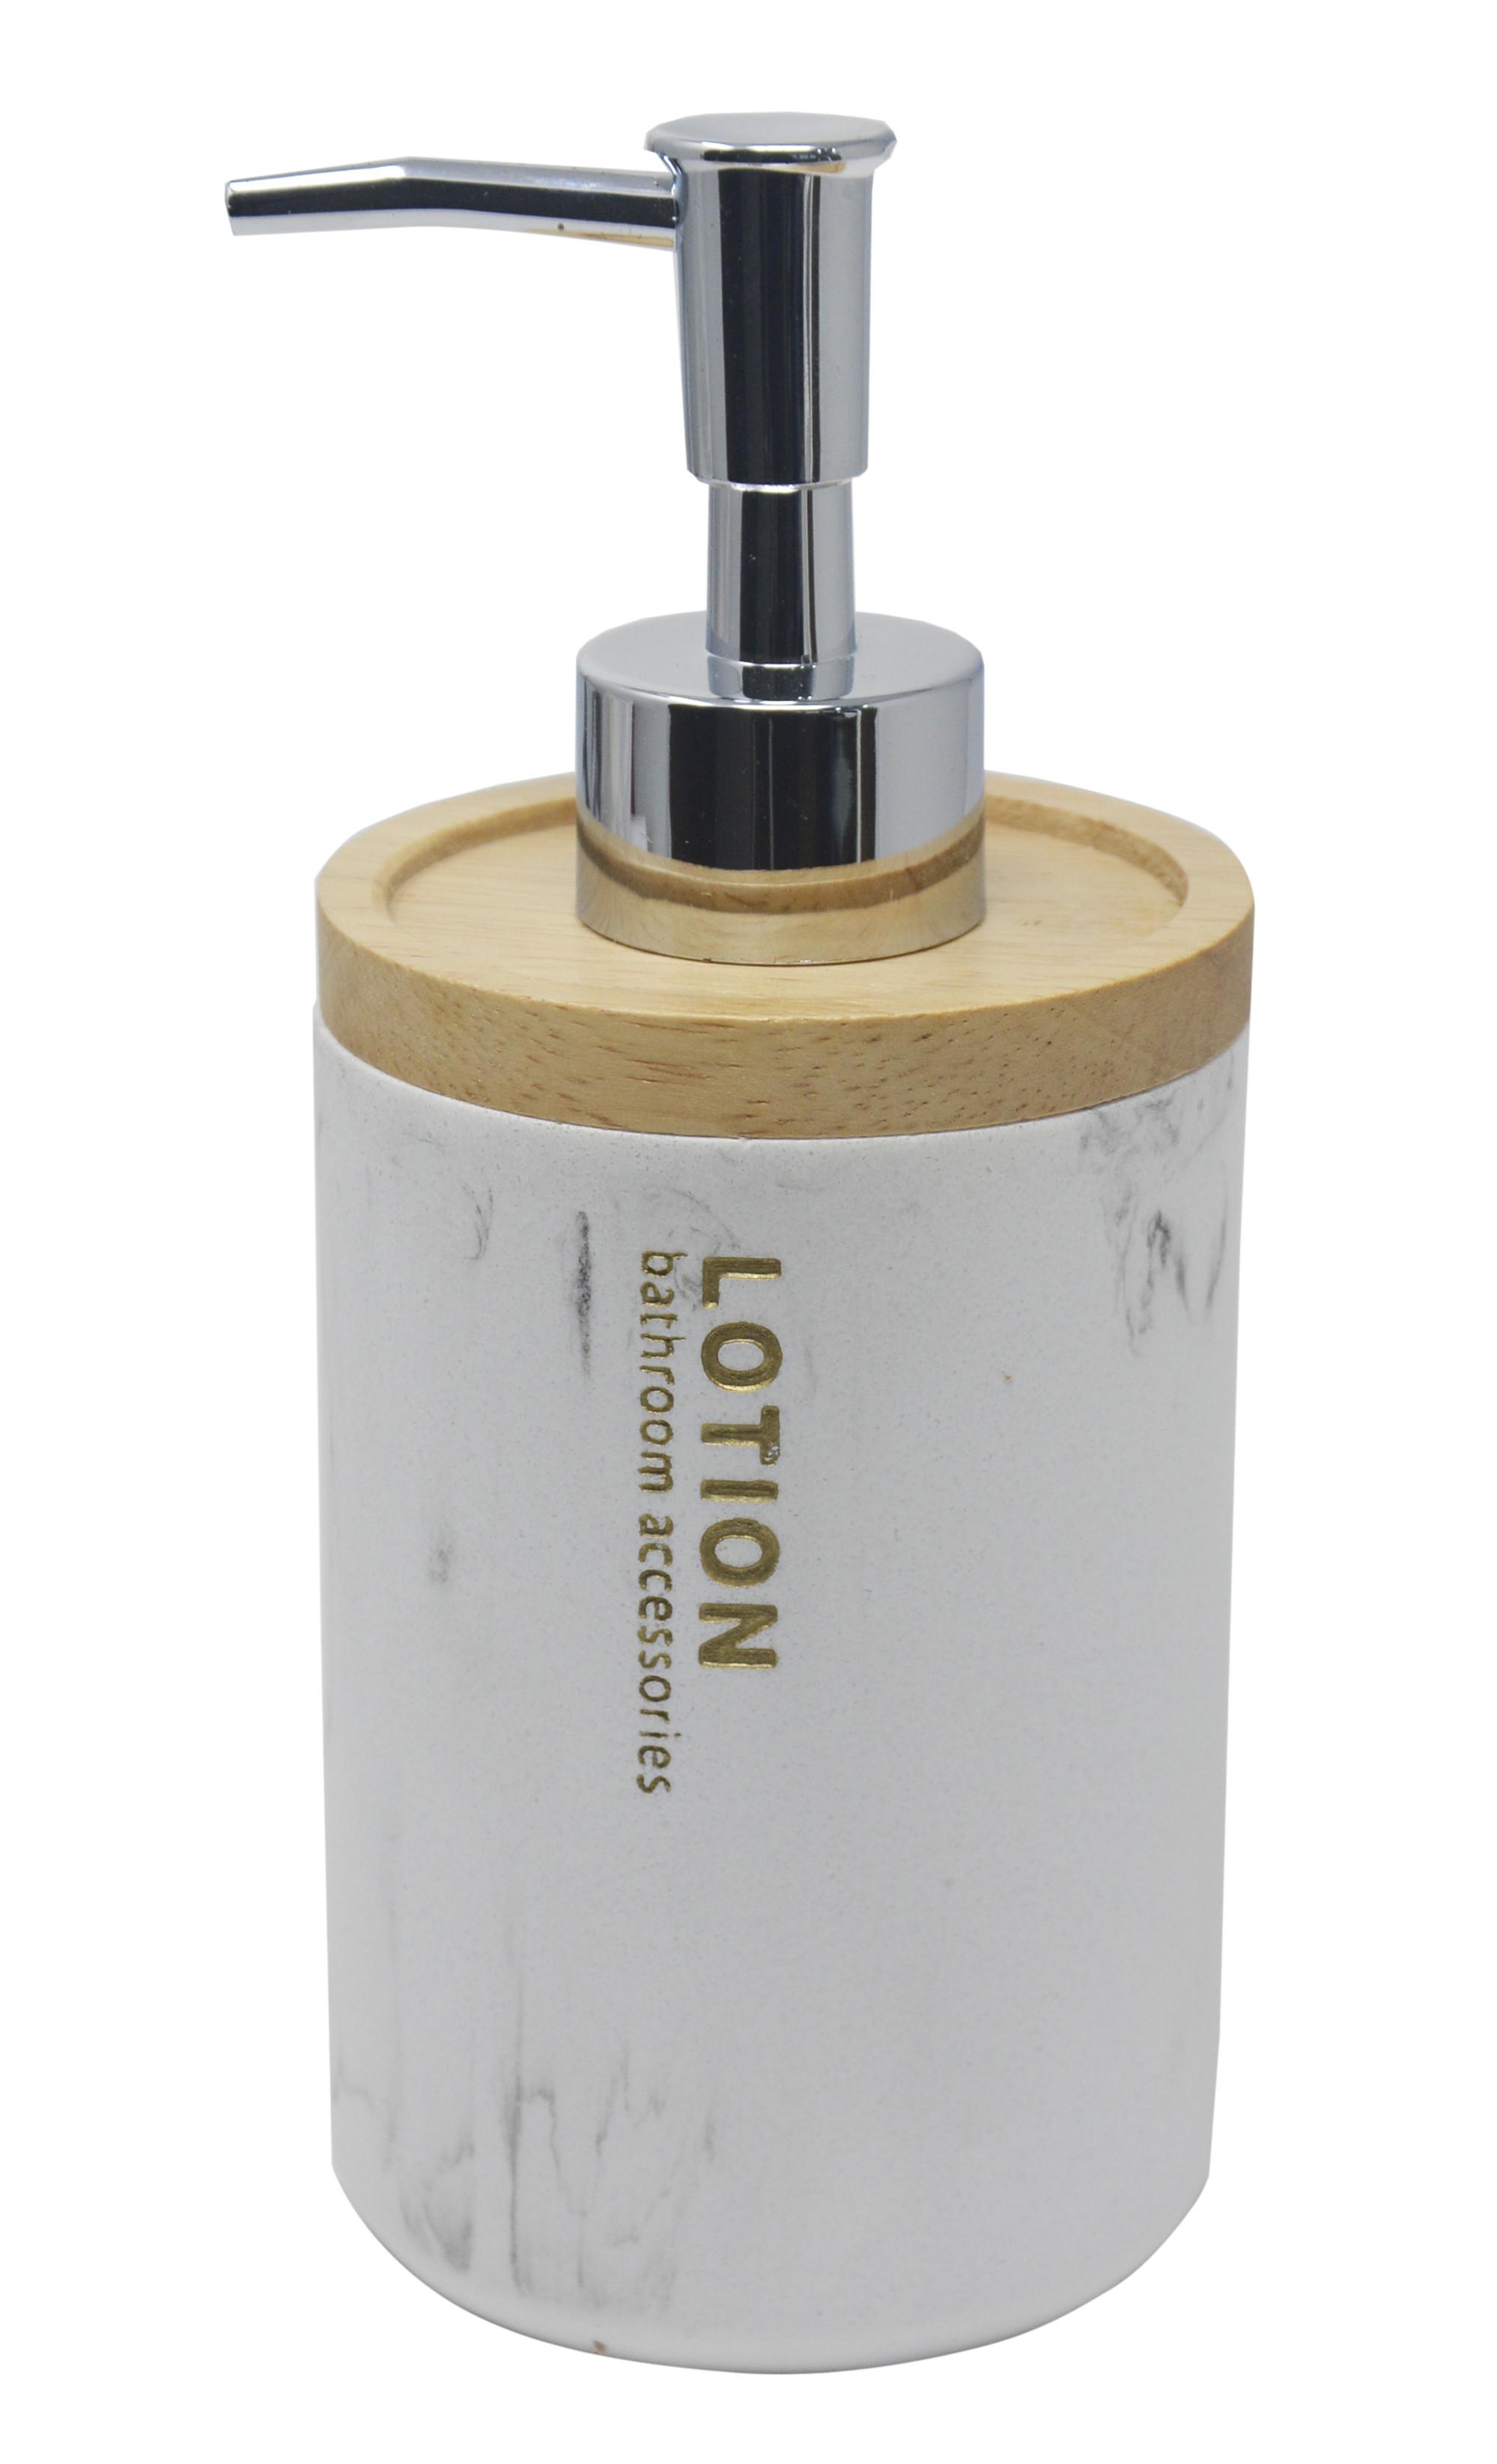 Dosificador Blanco de Resina con Tapa de Bambu, Dosificador con acabado de Marmol, Elegante/Moderno 18x7,5cm - Hogar y Más